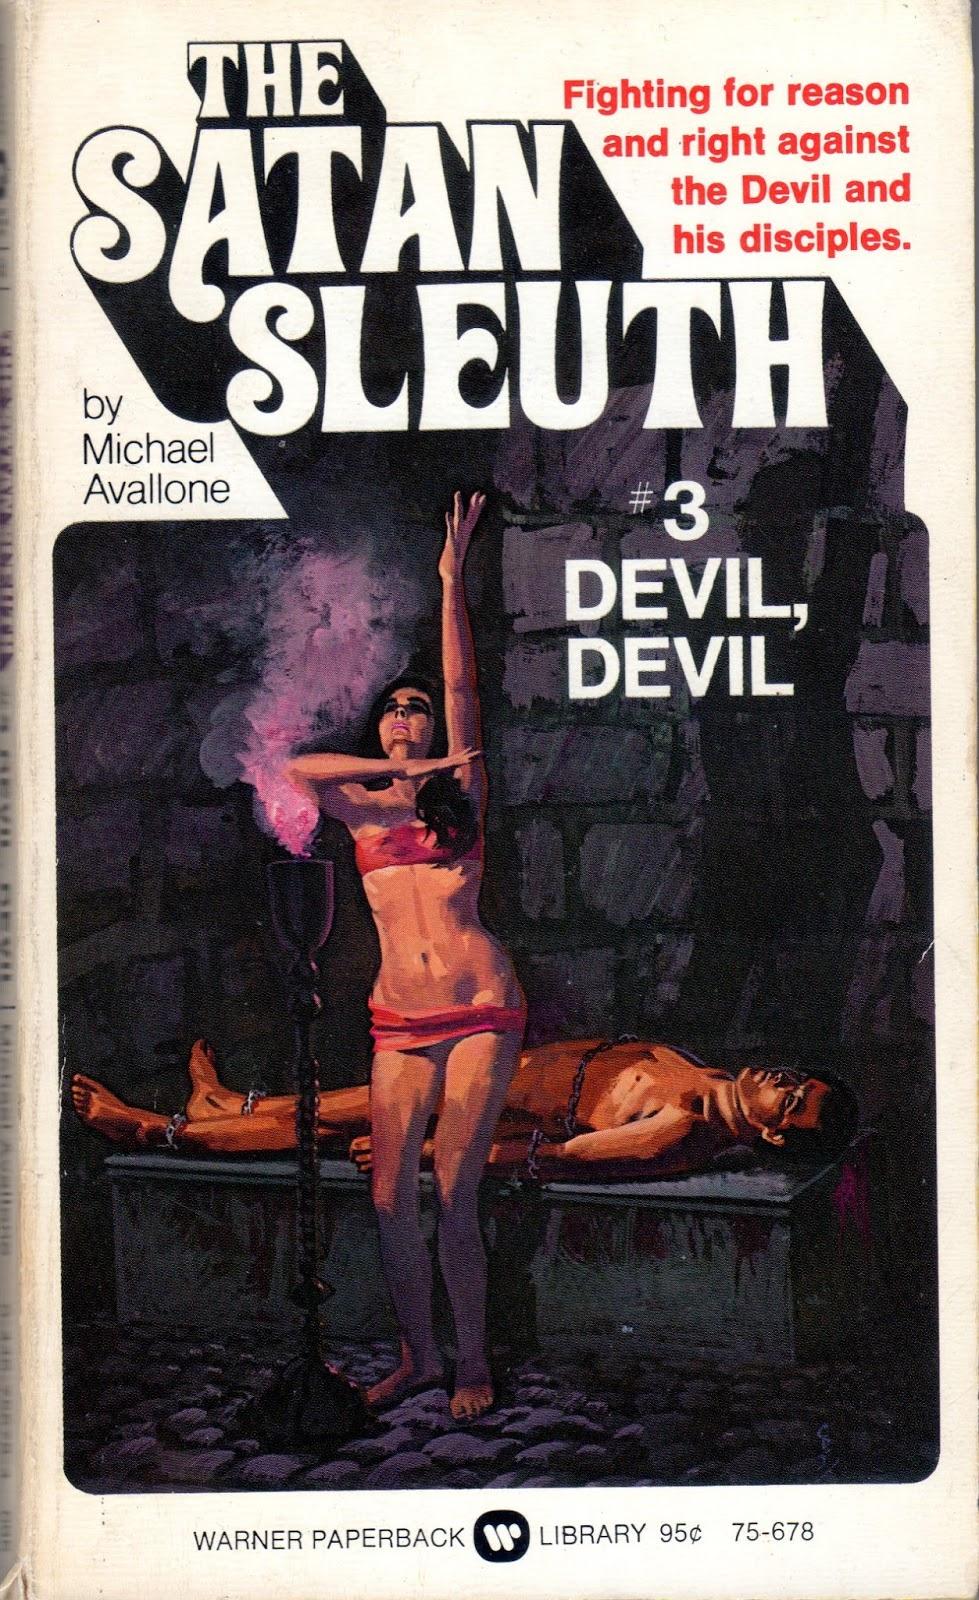 The Satan Sleuth # 2 Devil. Devil by Michael Avallone